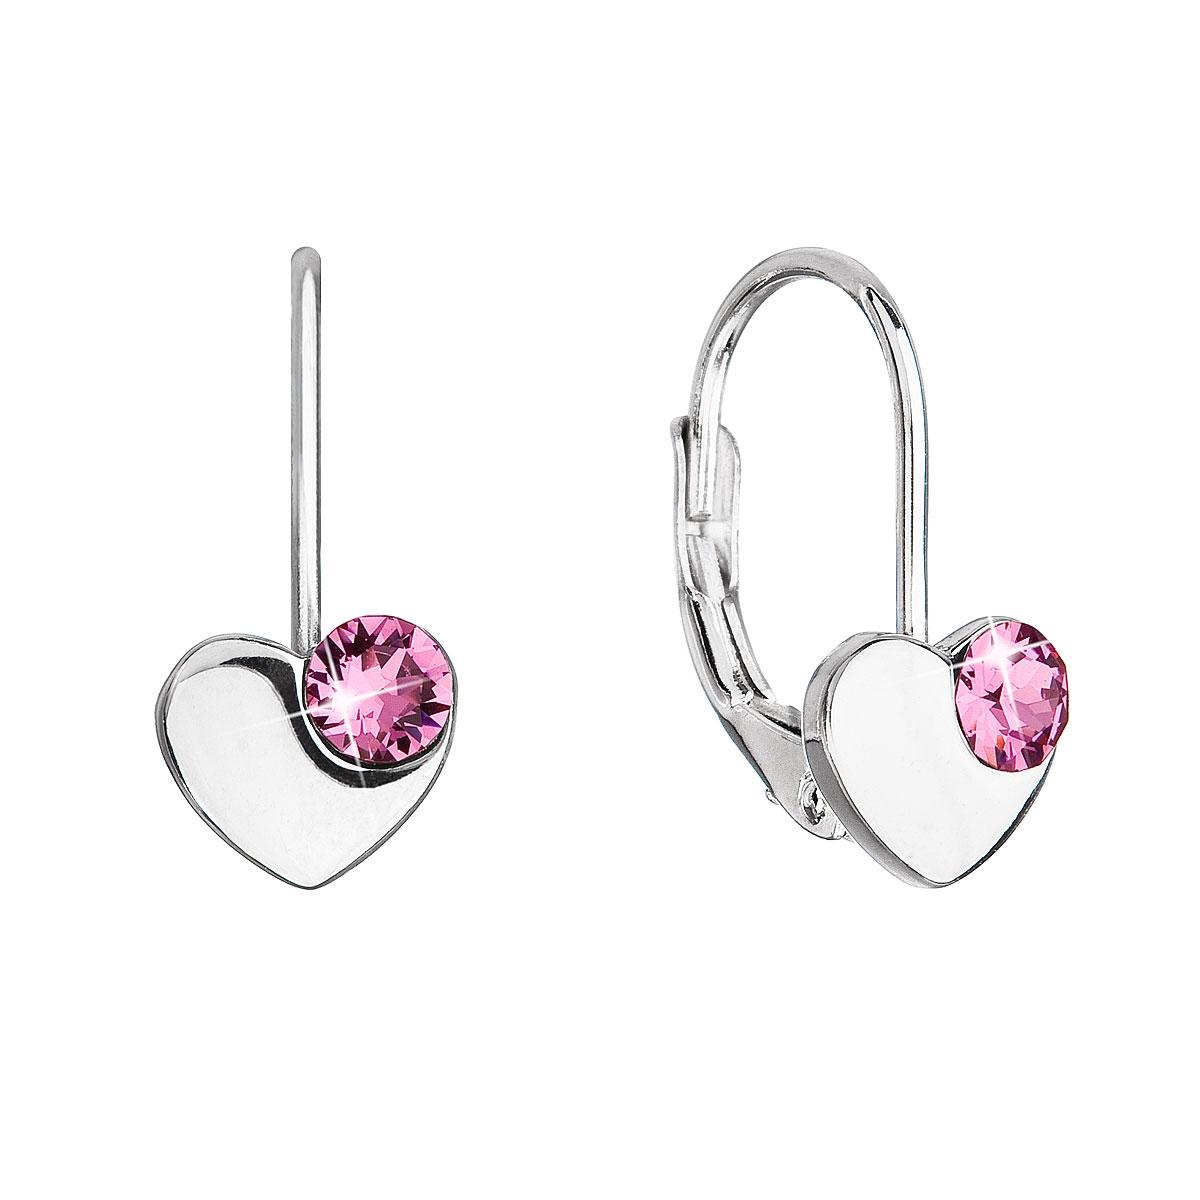 Stříbrné náušnice srdíčka se Swarovski krystaly, Rose EG2886-RO